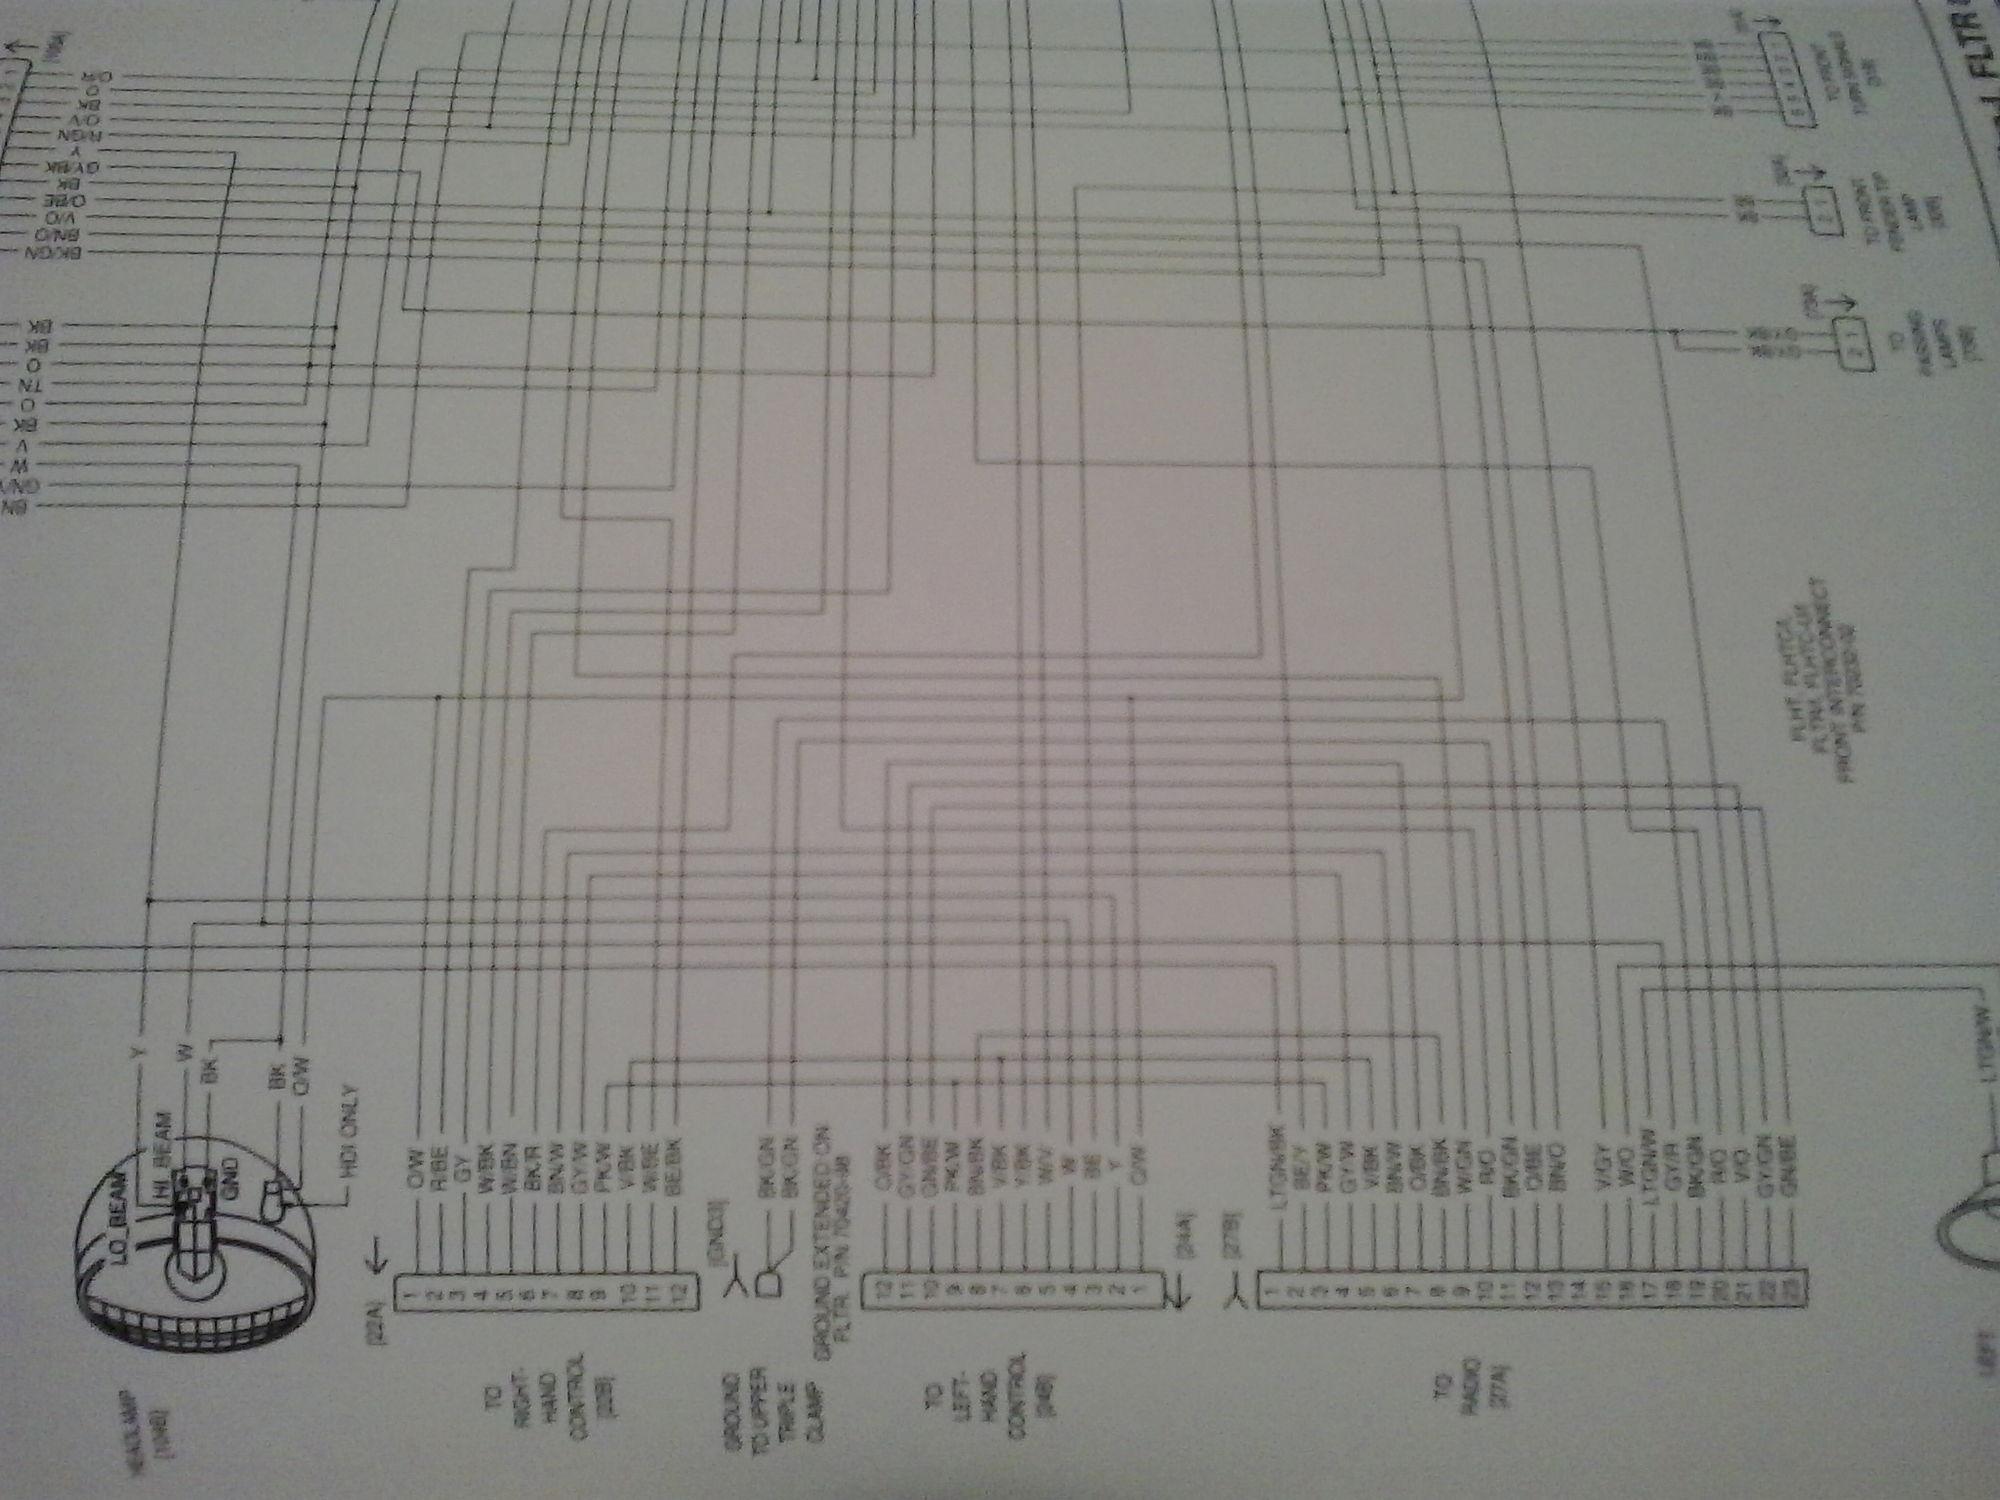 02 04 Road King Wiring Harness Help Please